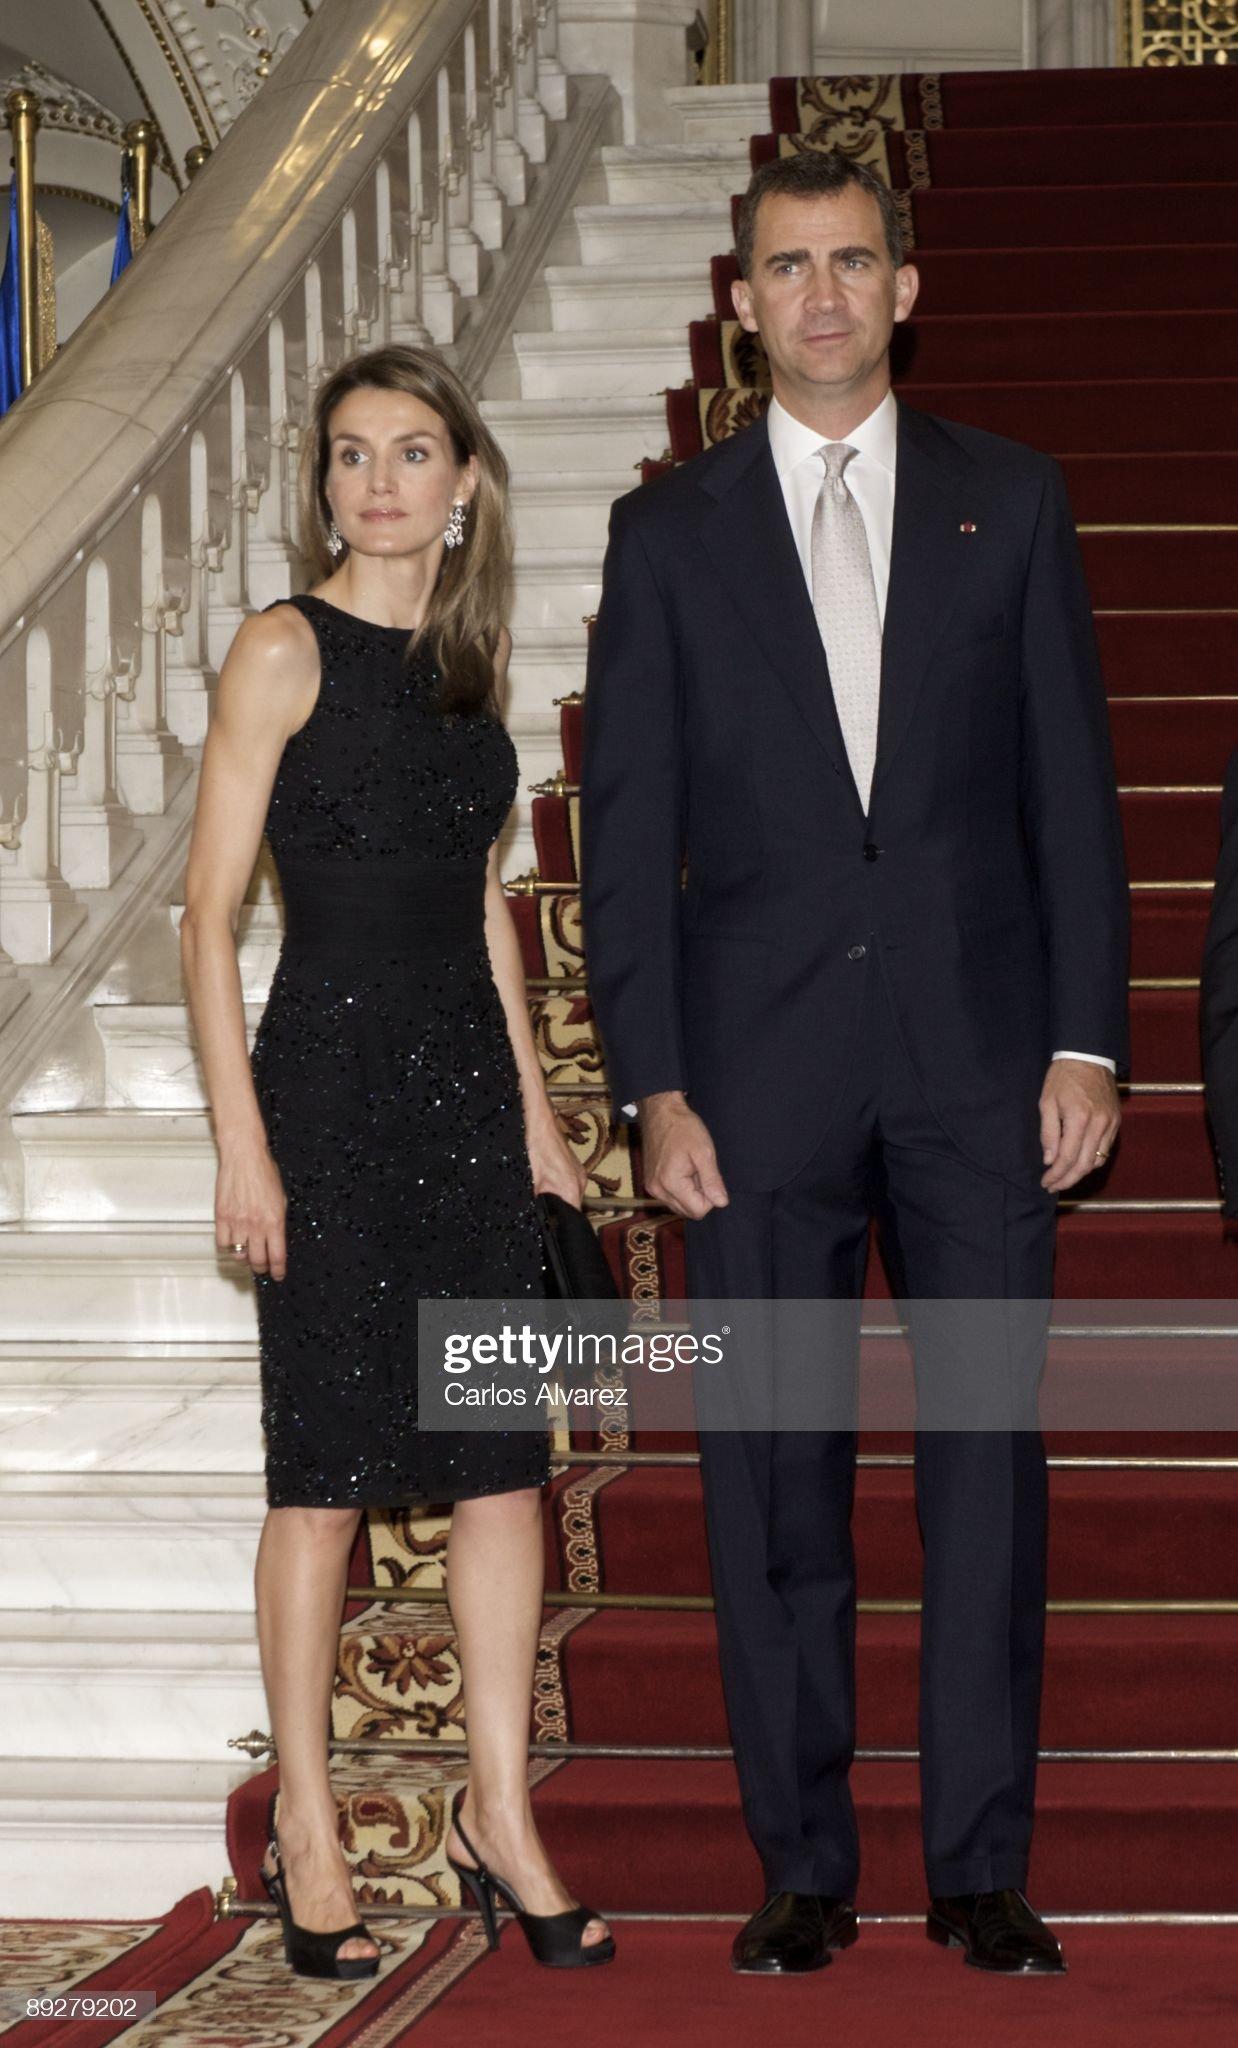 Вечерние наряды Королевы Летиции Prince Felipe & Princess Letizia Visit Romania - Day 1 : News Photo